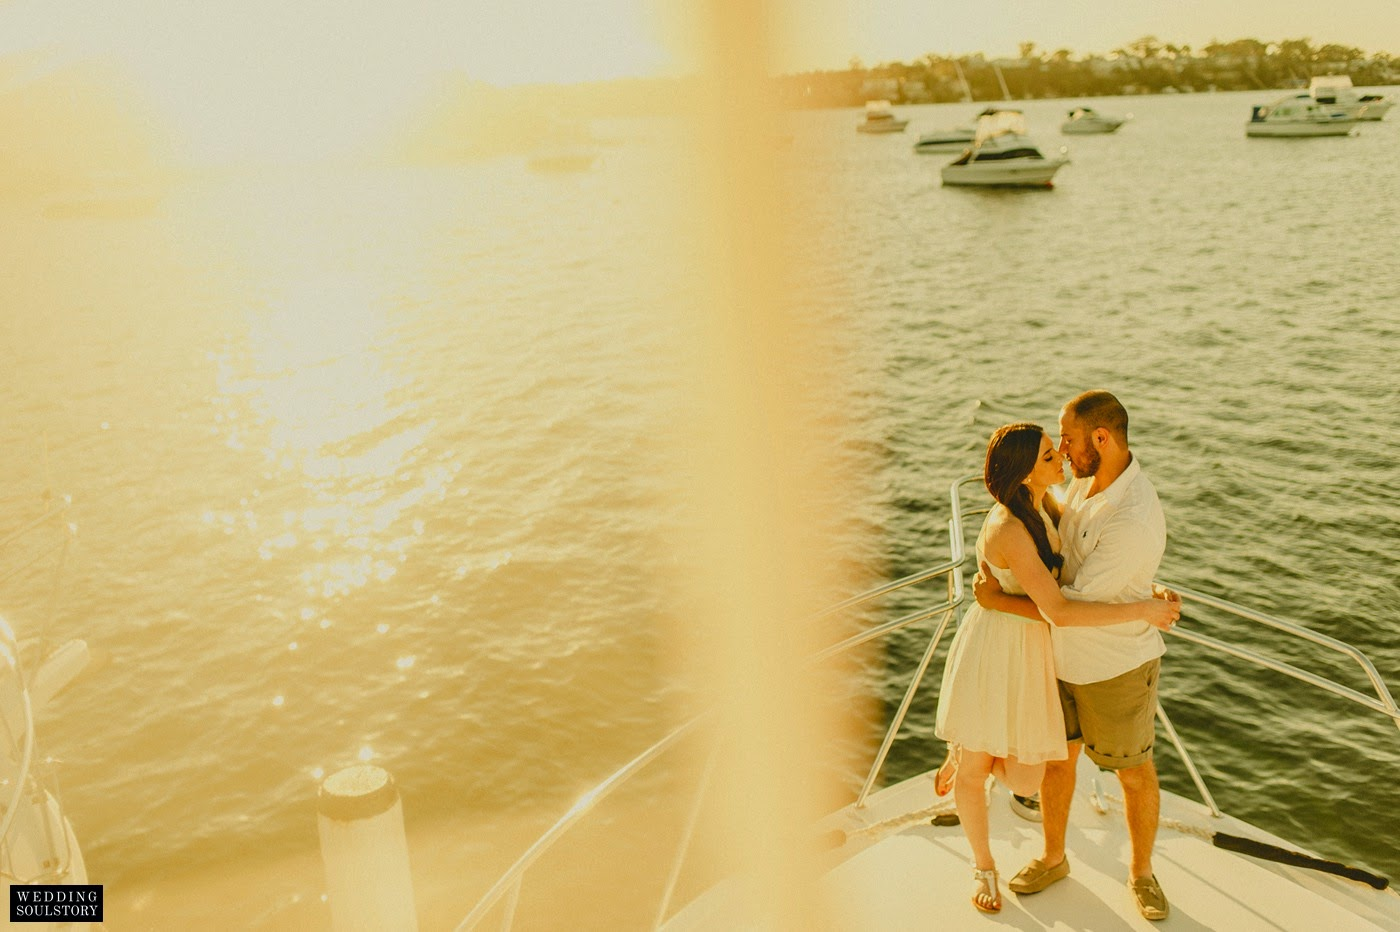 LMqbISA3Hb4 - Трагические заблуждения относительно брака